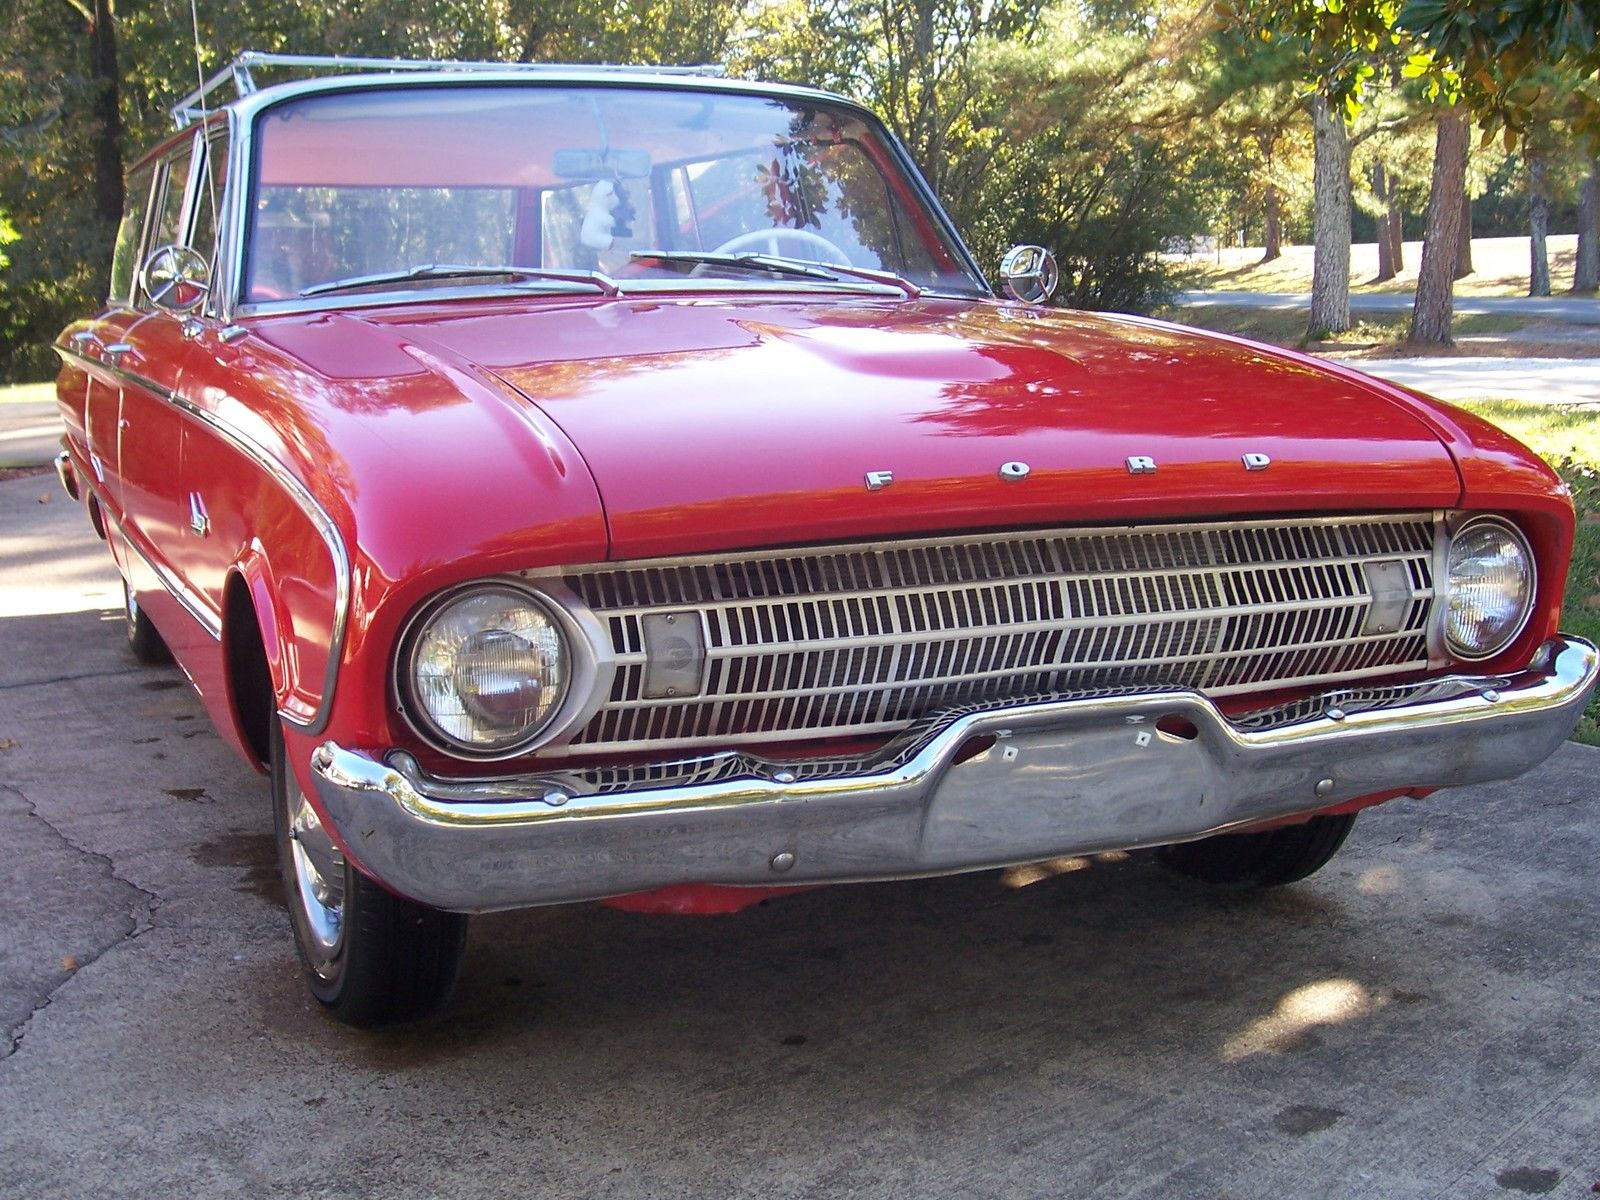 Stunning 1961 Ford Falcon Sprint Wagon 53k Miles S Match Very Nice 1964 Futura